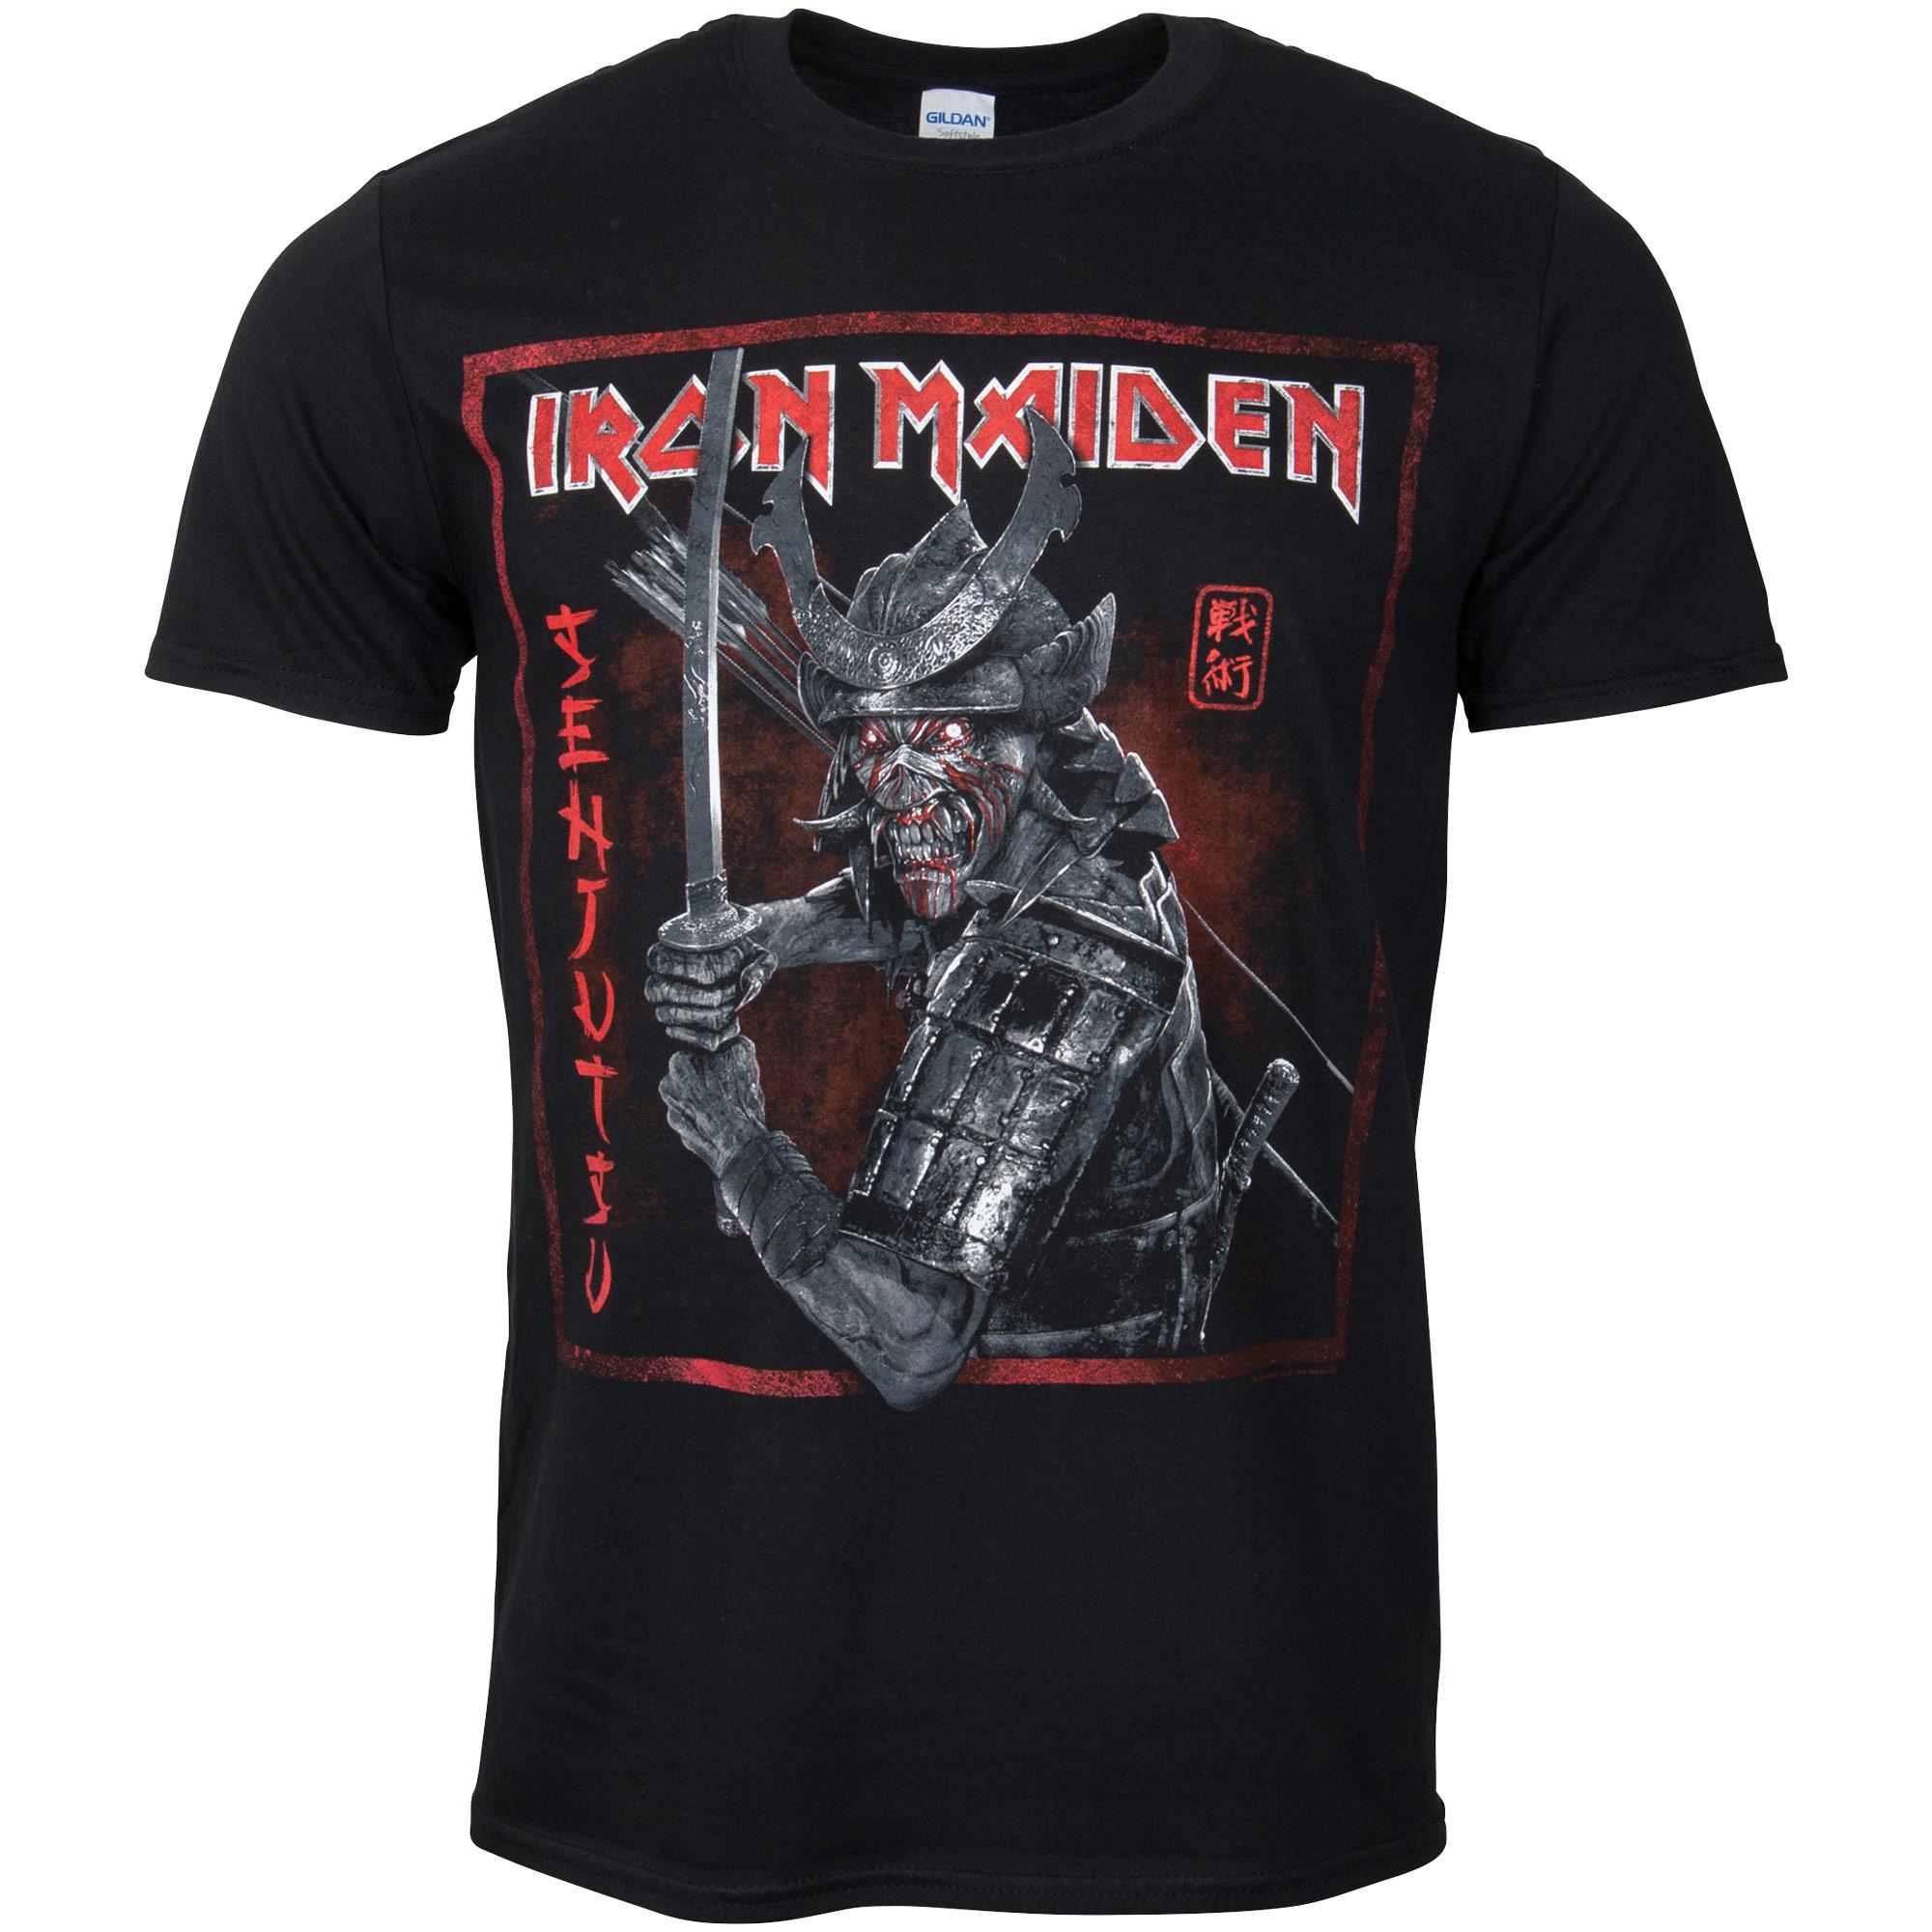 Iron Maiden - T-Shirt Senjutsu Cover Distressed Red - schwarz